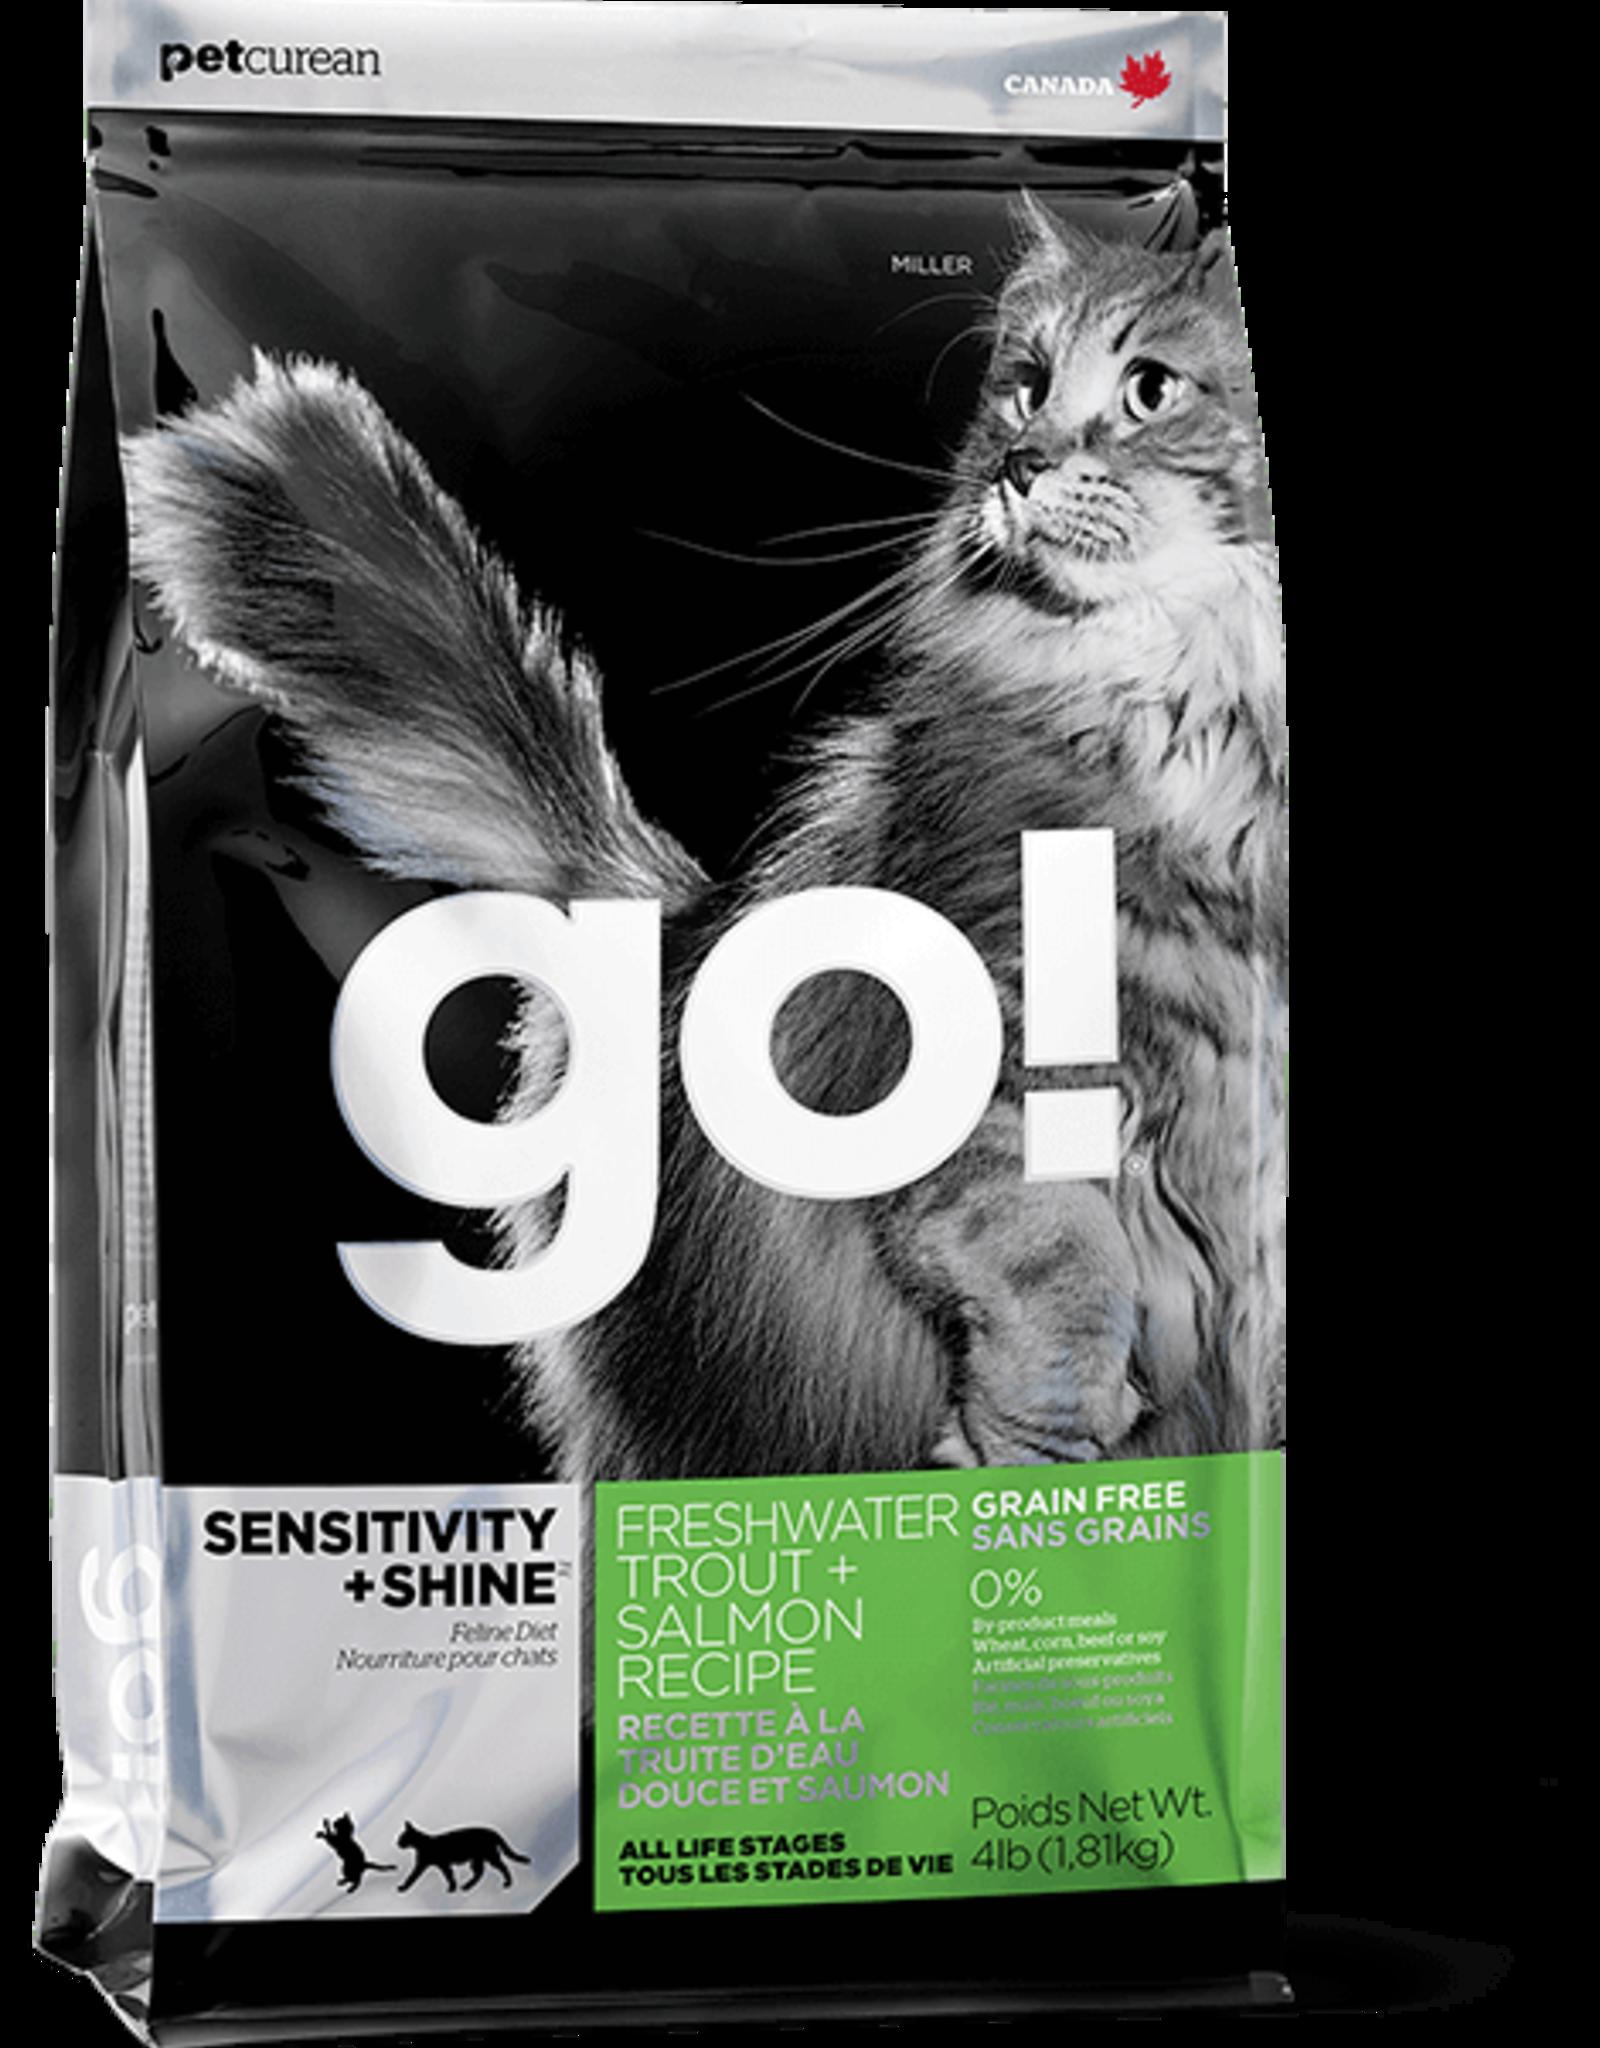 Petcurean Go Sensitivity+Shine Cat Grain Free Trout Salmon 8lb